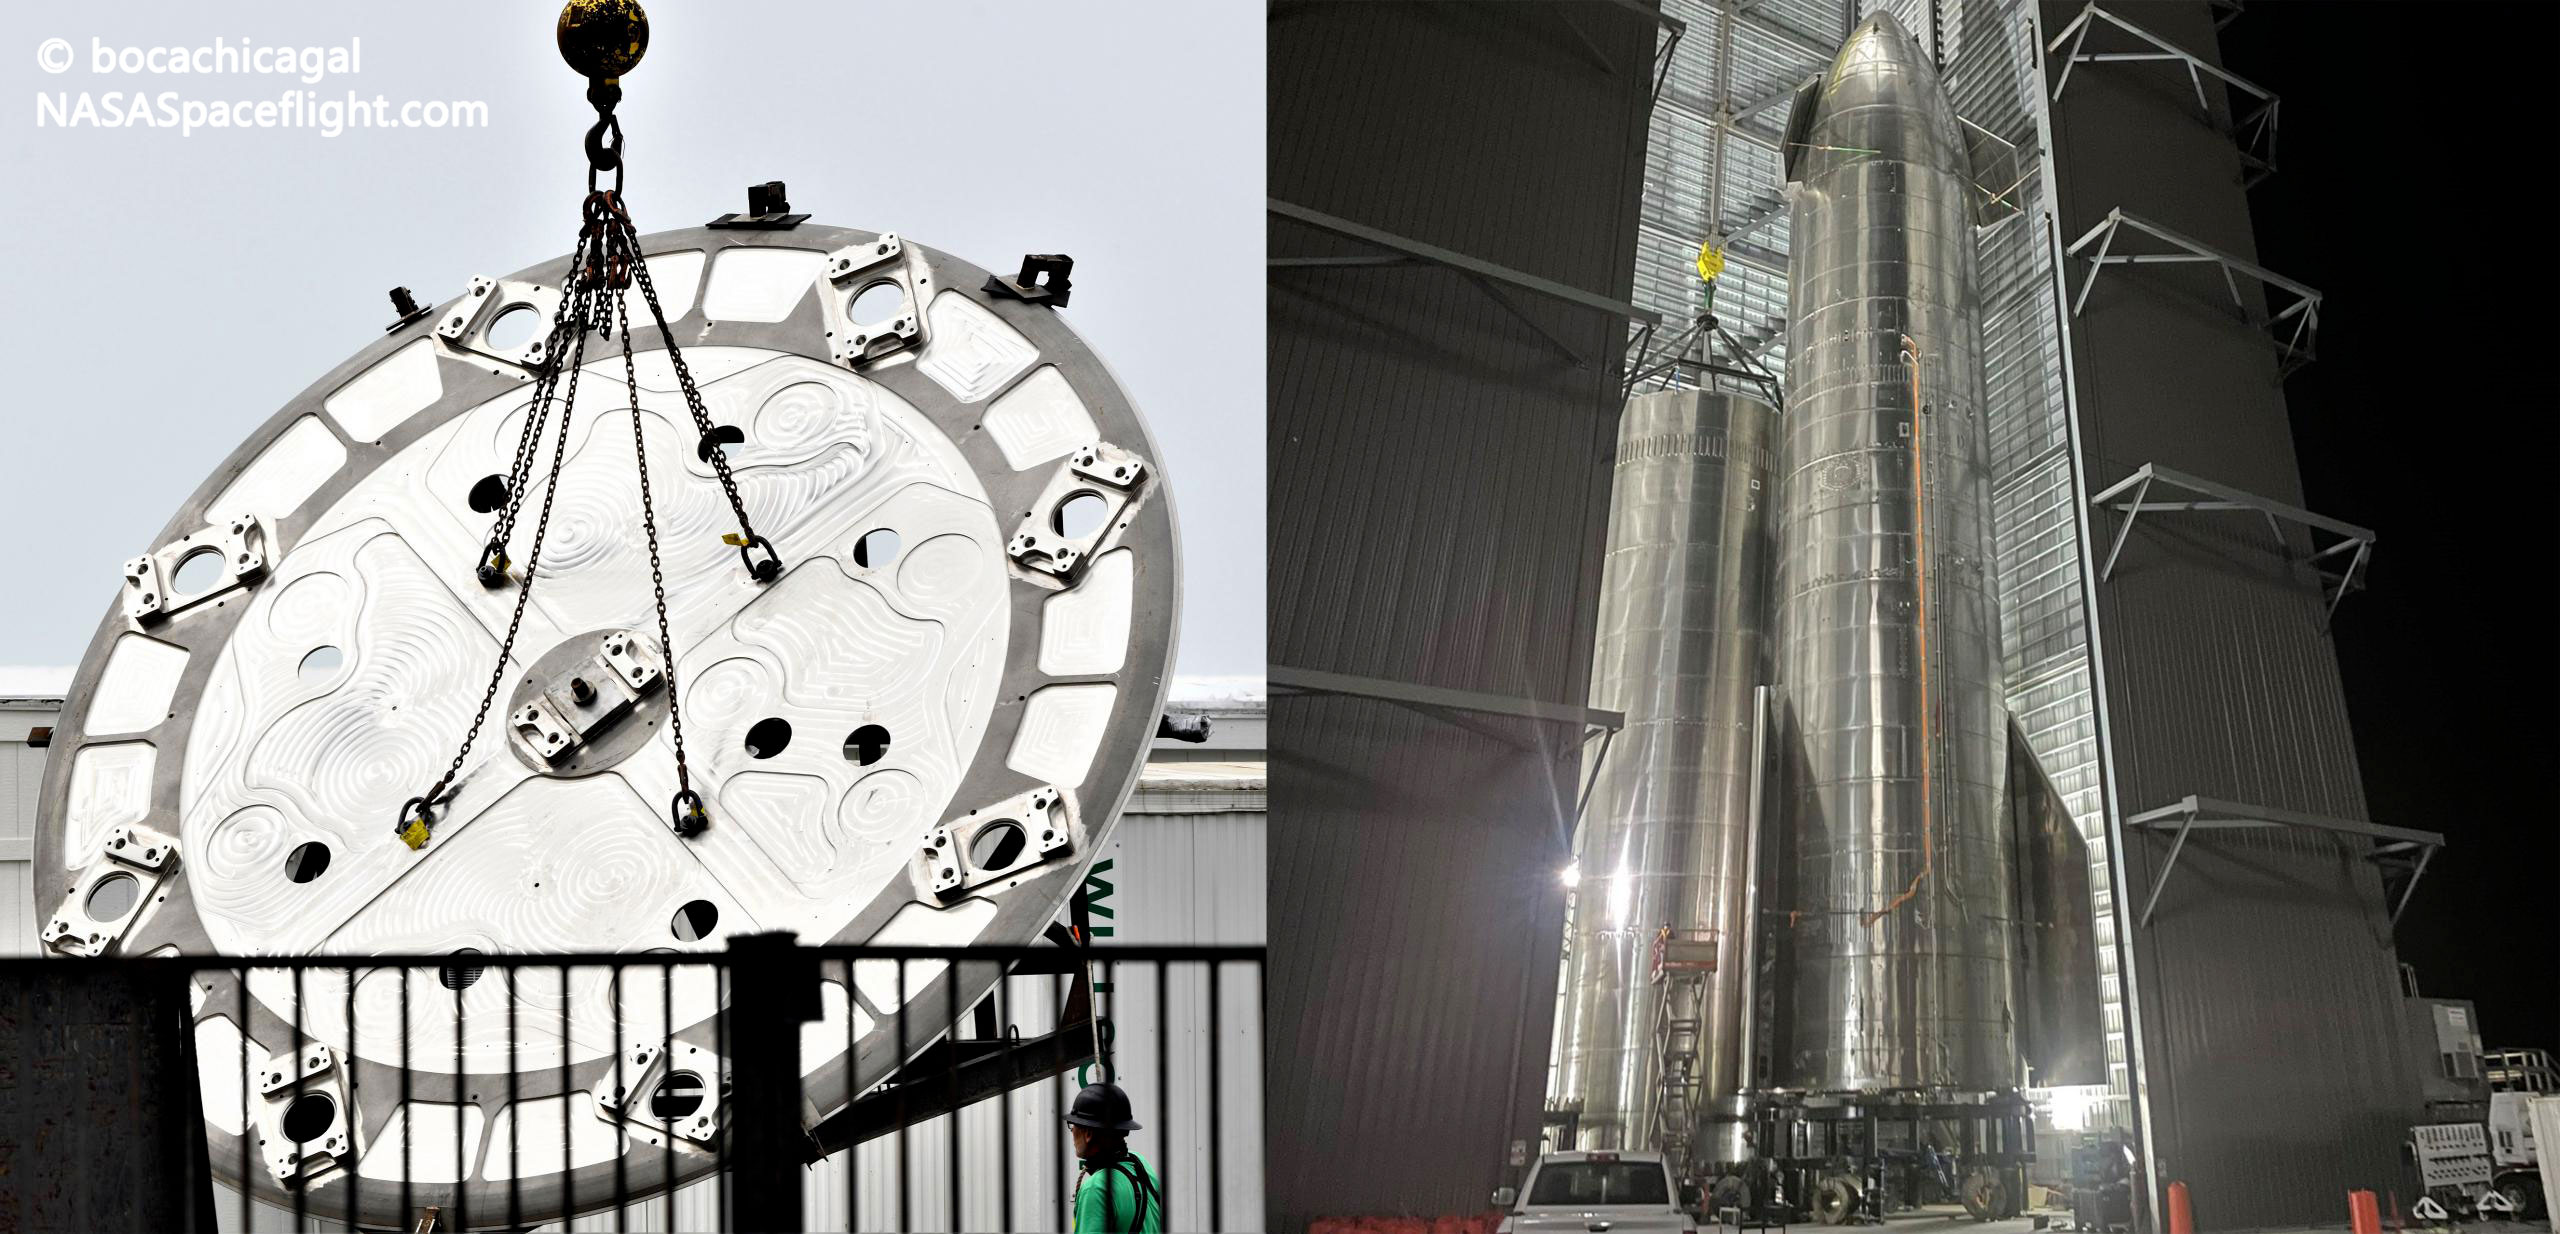 Starship Boca Chica 052921 (NASASpaceflight – bocachicagal) booster thrust puck + BN2 2 (c)